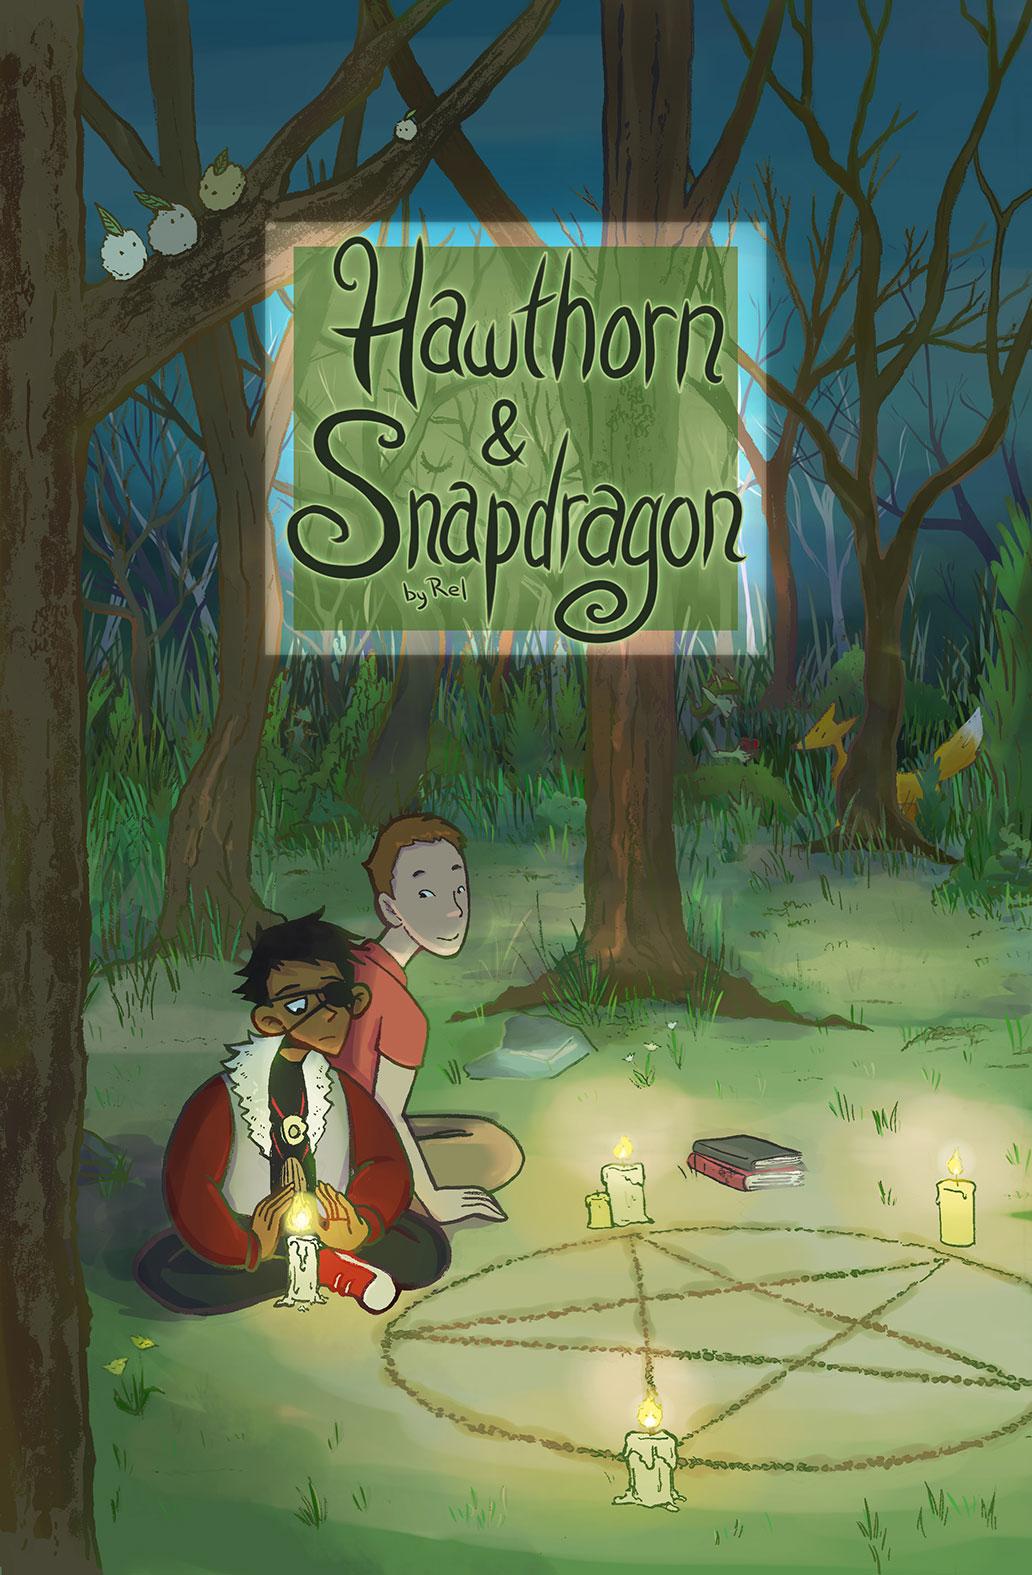 Hawthorn & Snapdragon